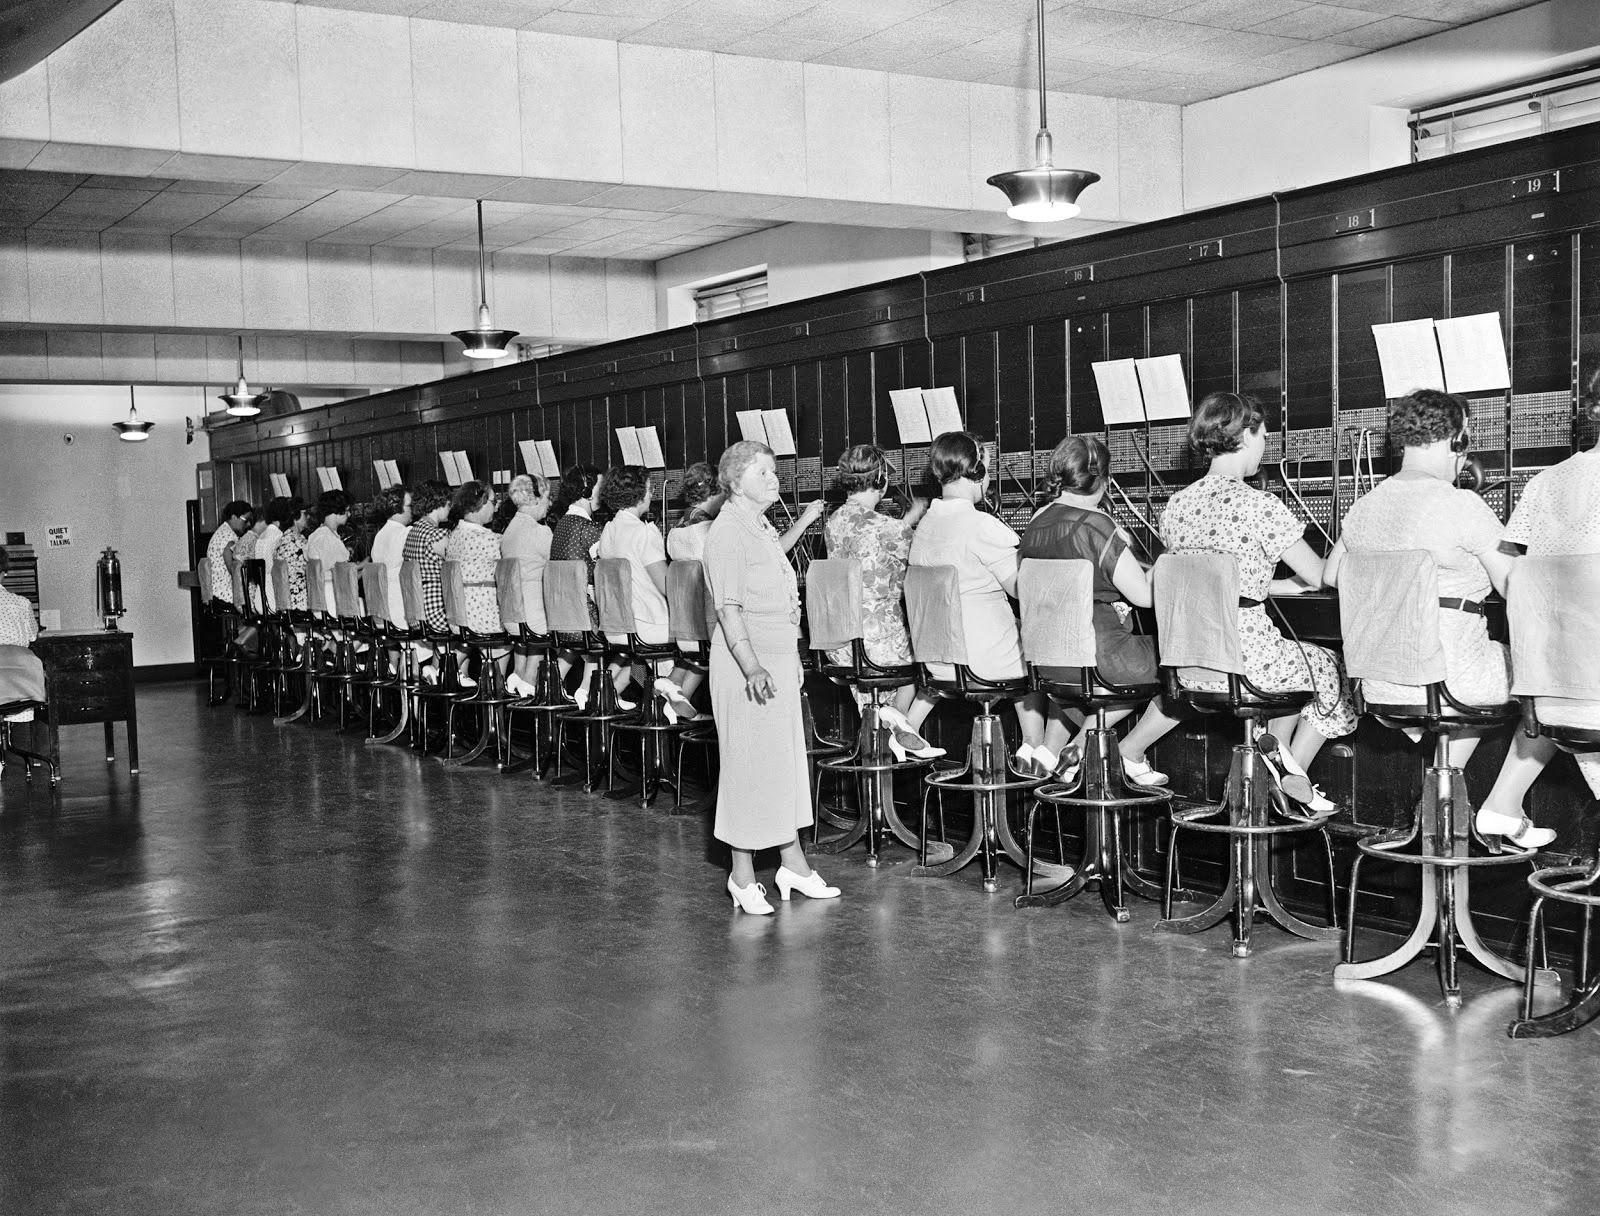 20 Vintage Photos of Women Telephone Operators at Work